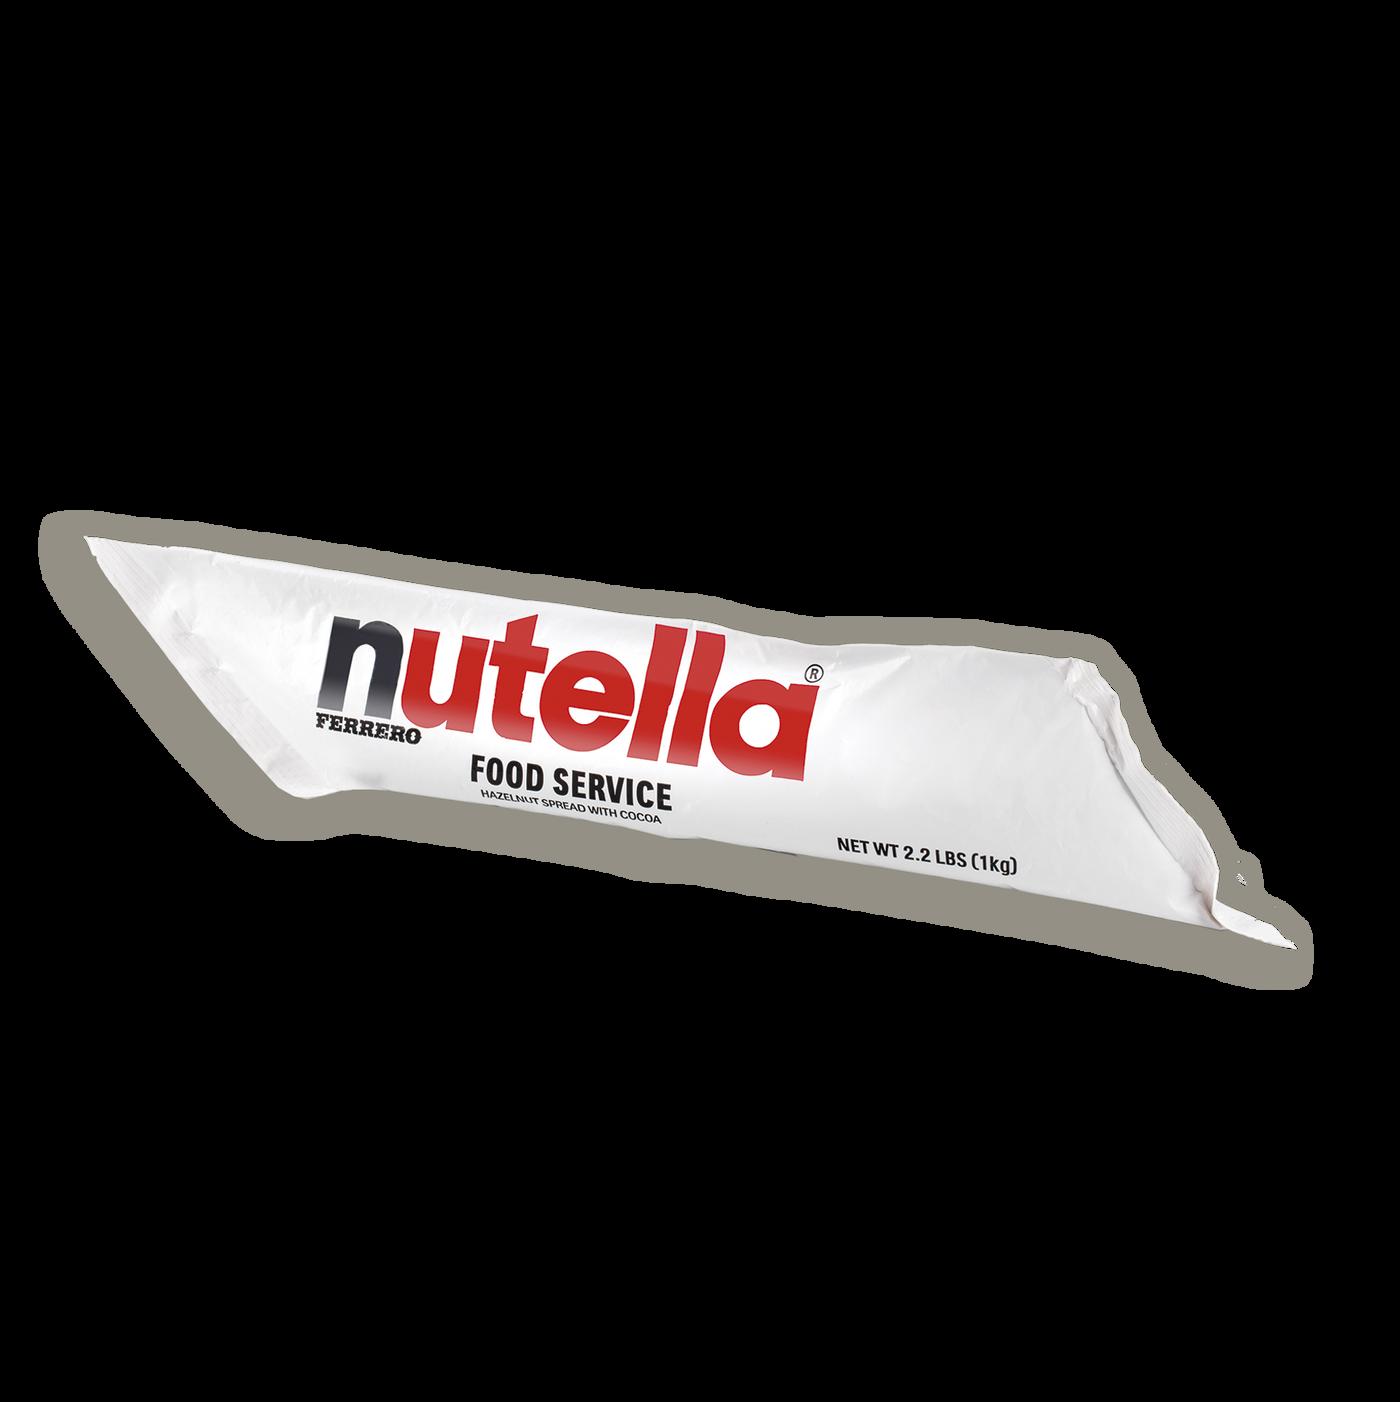 Nutella Manga Pastelera